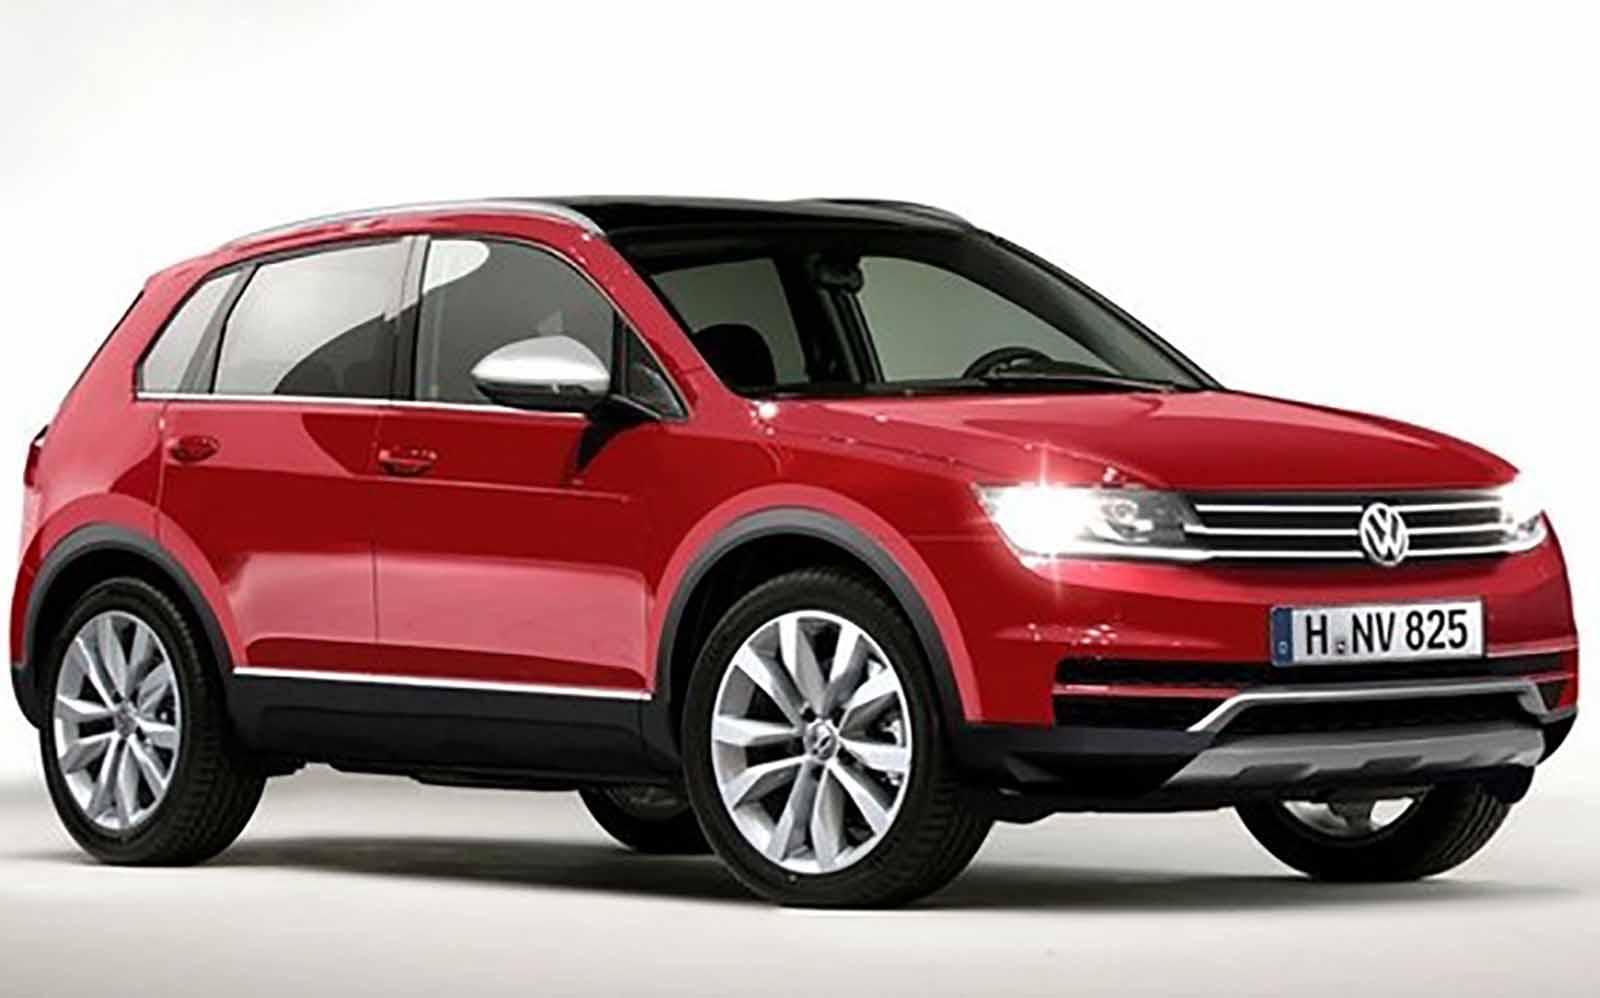 Volkswagen Prepara Ofensiva Com 5 Novos Suv At 233 2017 Car